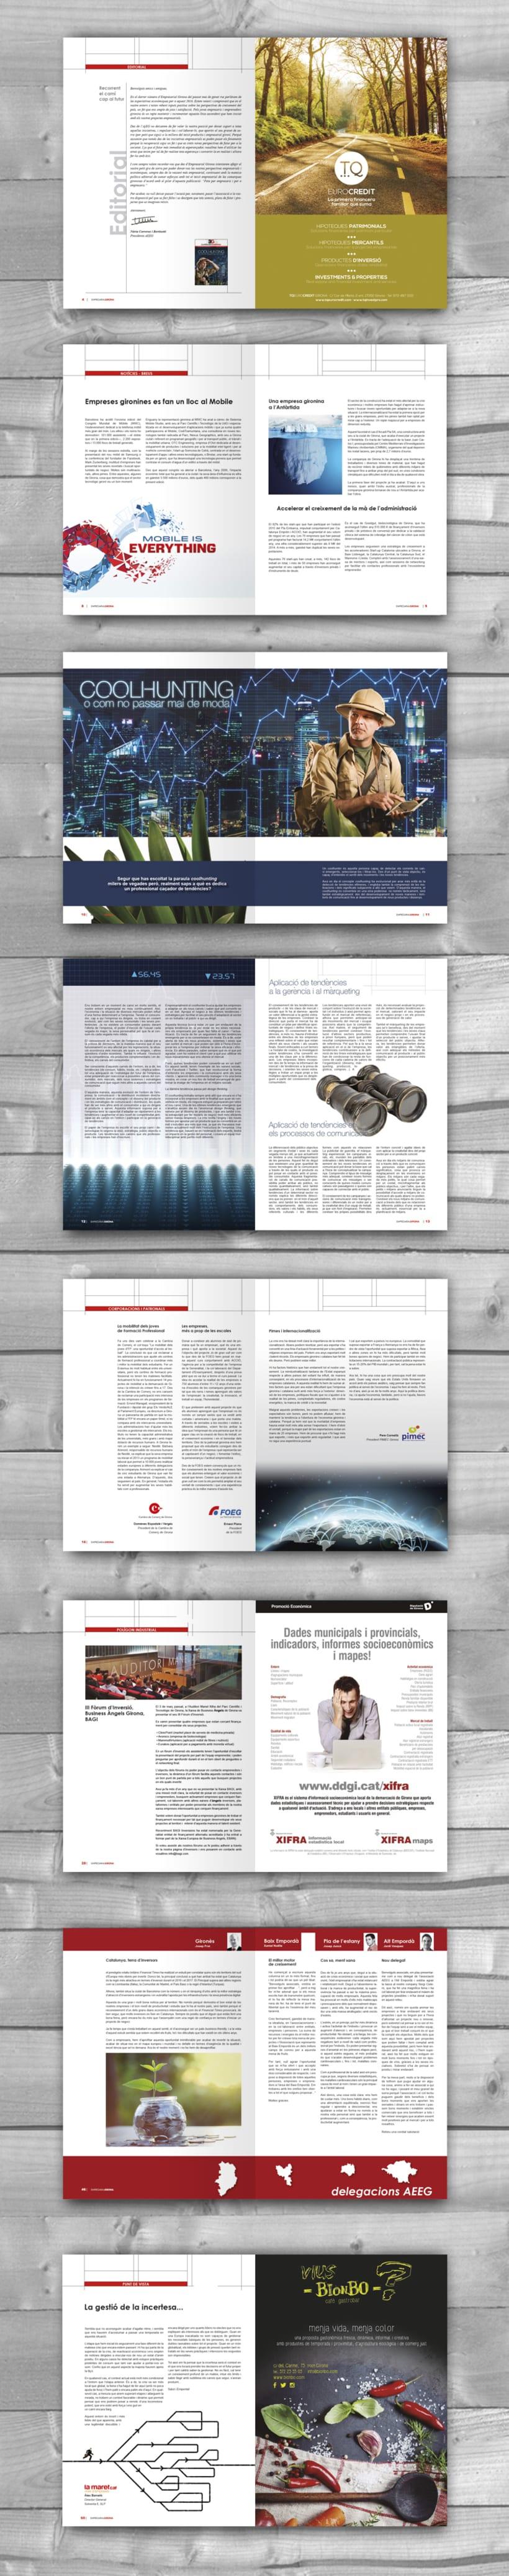 Revista EMPRESARIAL GIRONA n. 37 1